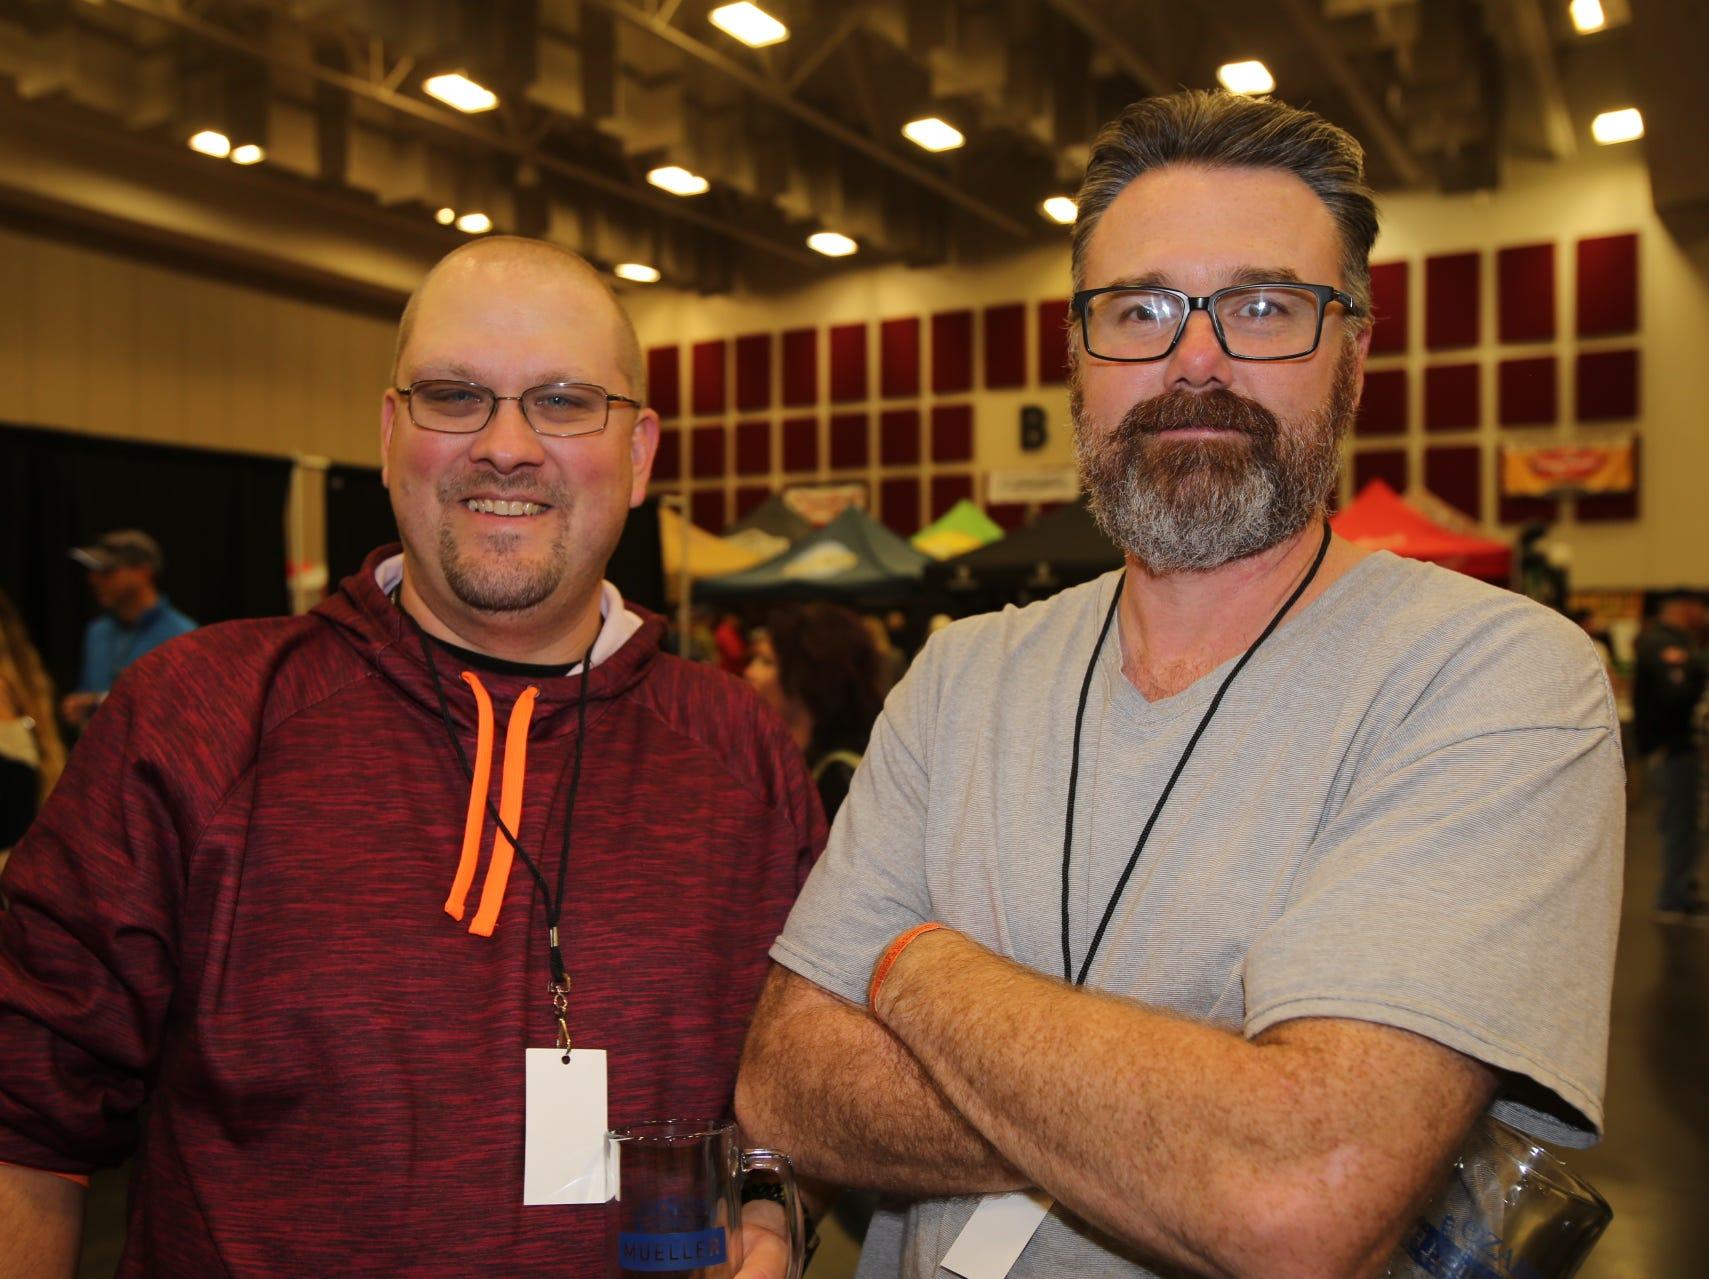 Dustin Crayton and Mark Miller